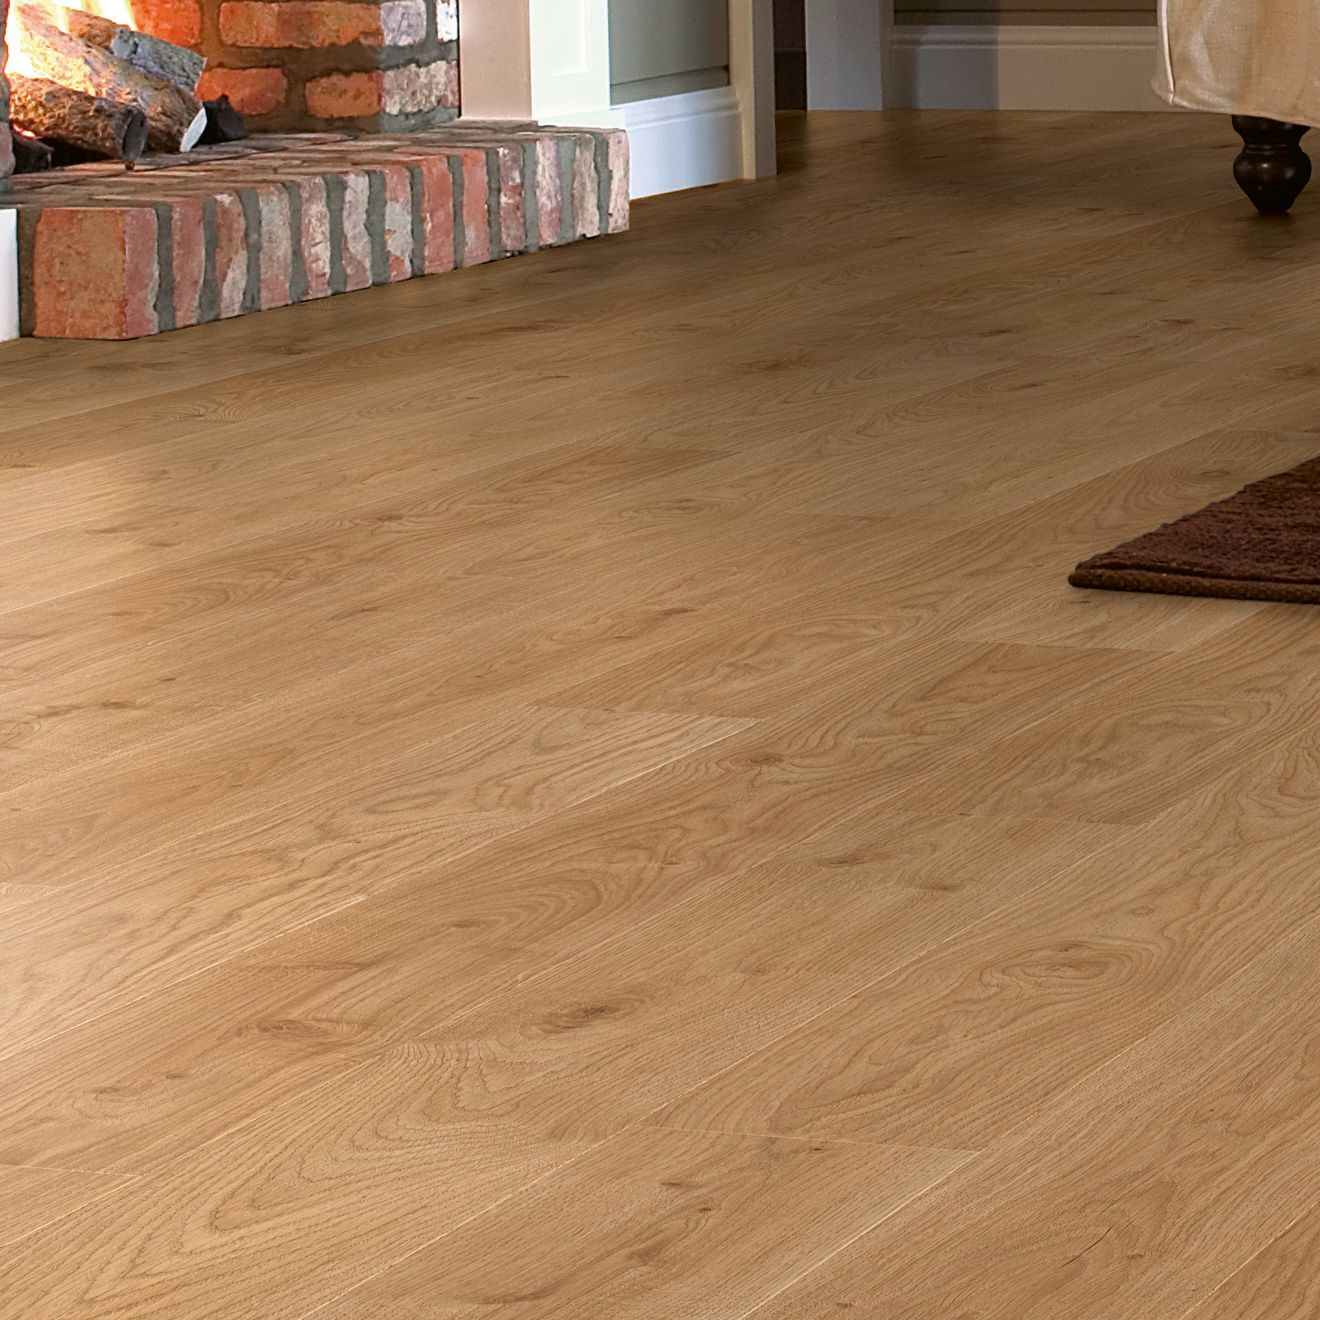 Awesome Natural Oak Effect Laminate Flooring Part - 9: Andante Natural White Oak Effect Laminate Flooring 1.72 M² Pack |  Departments | DIY At Bu0026Q